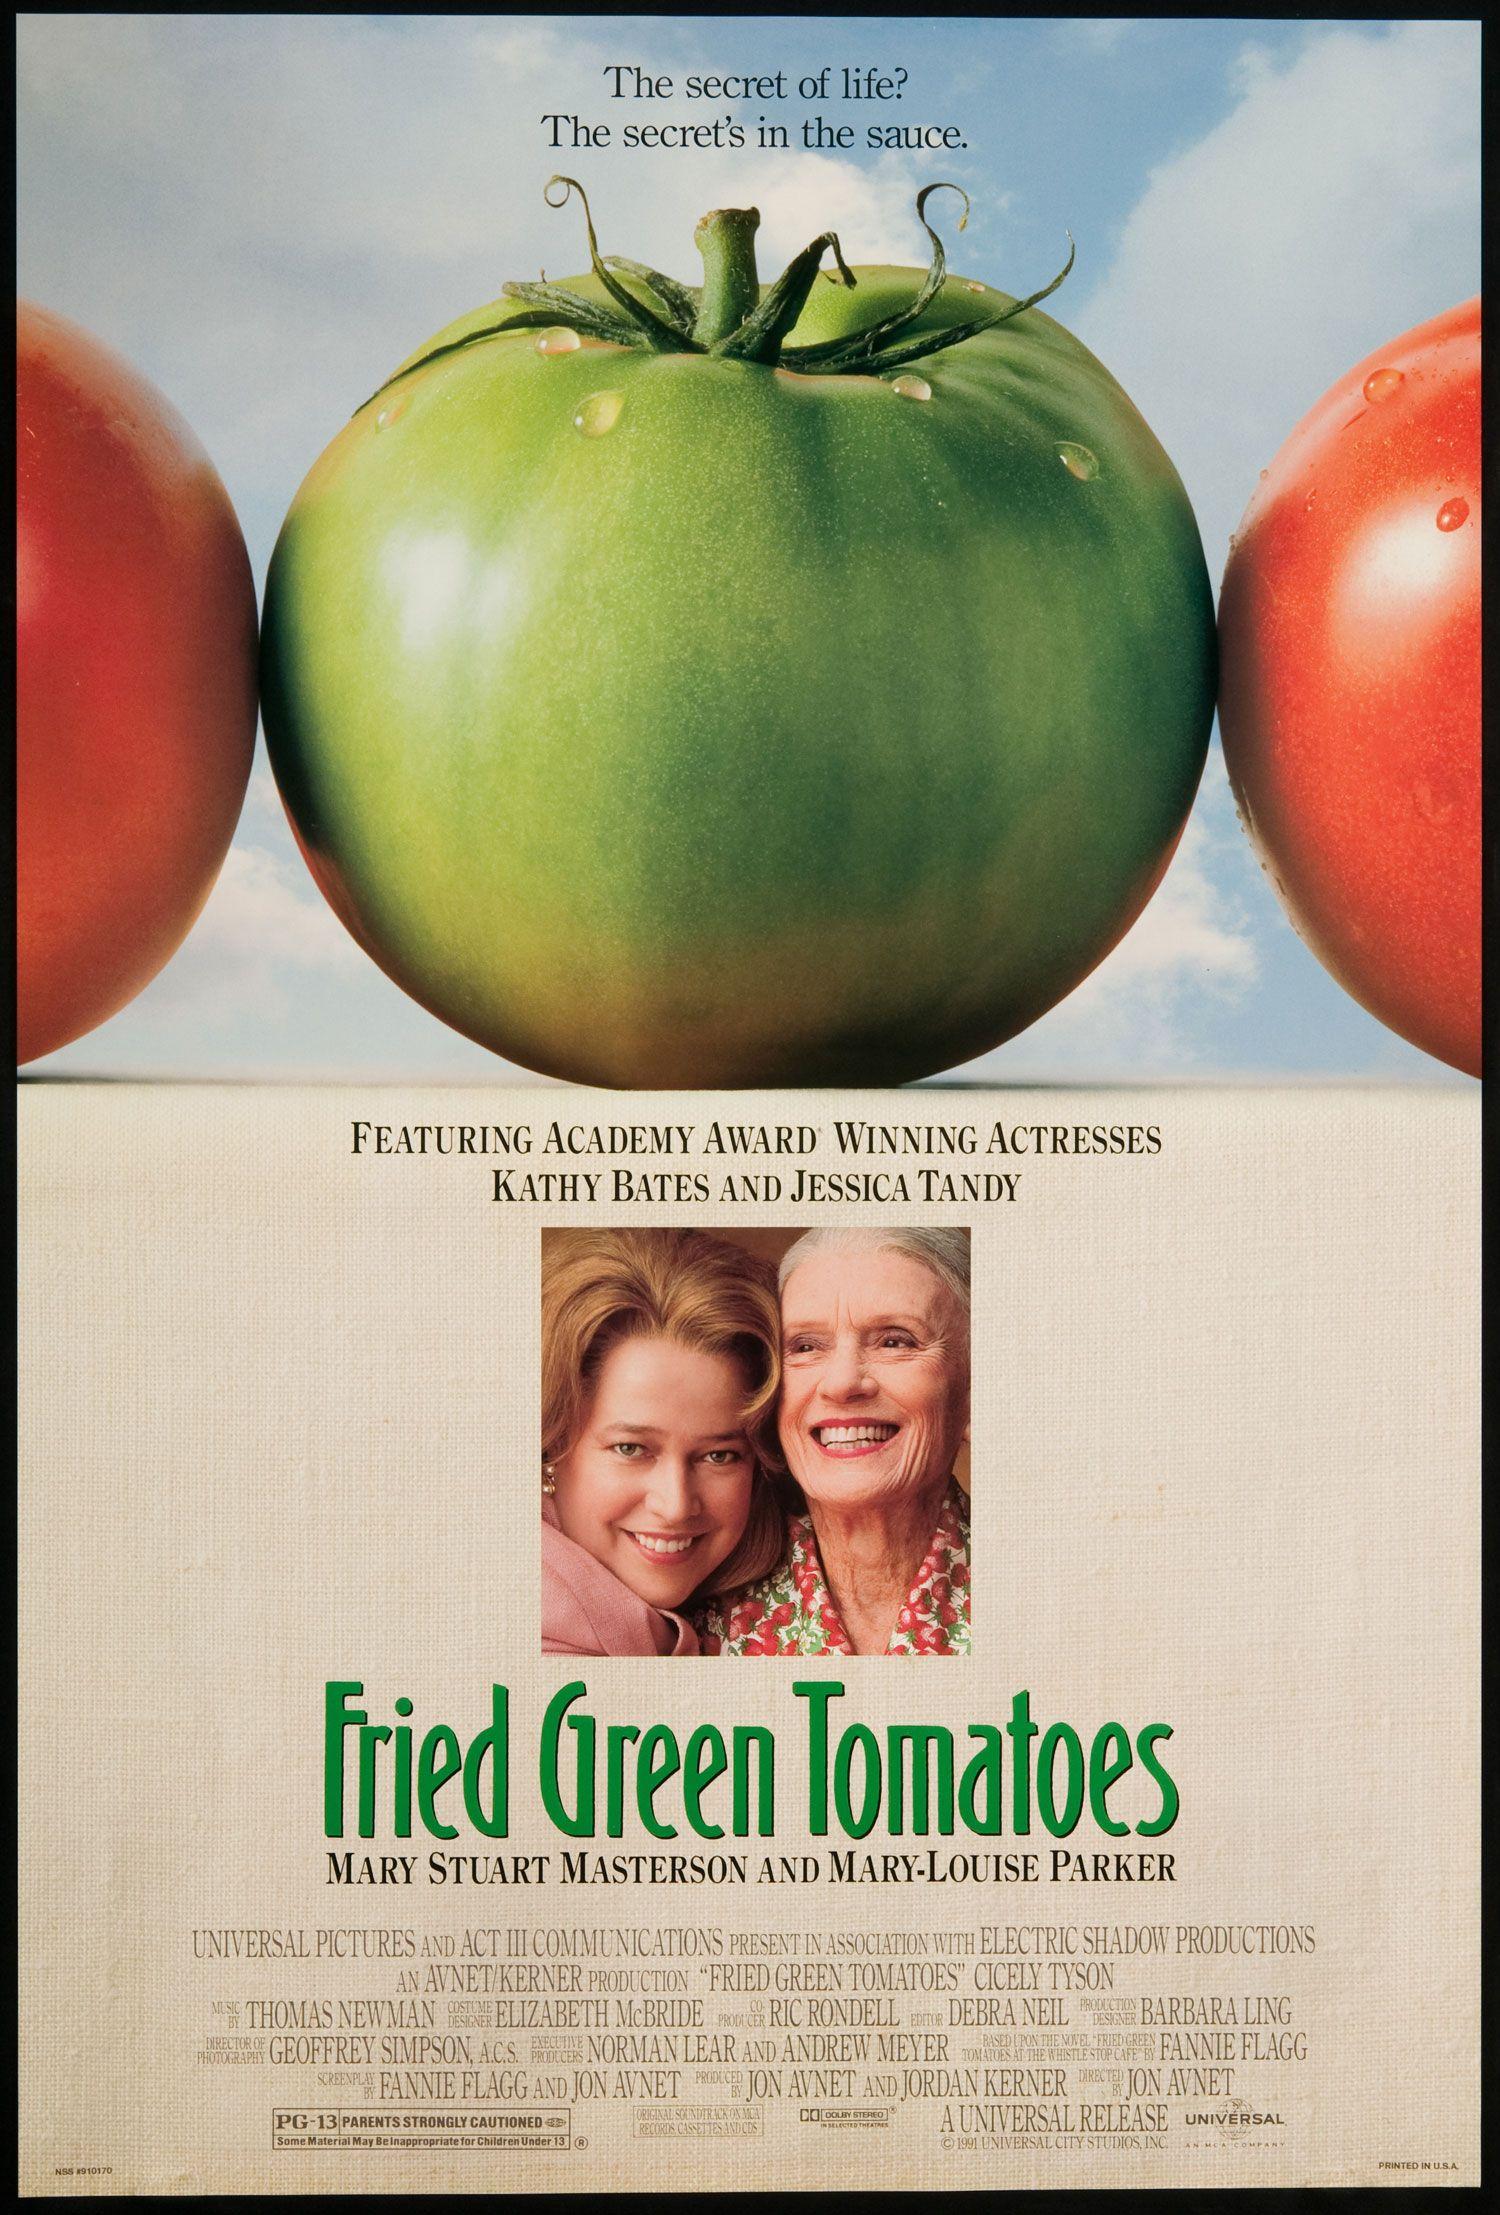 Fried Green Tomatoes (1991) friedgreentomatoes Fried